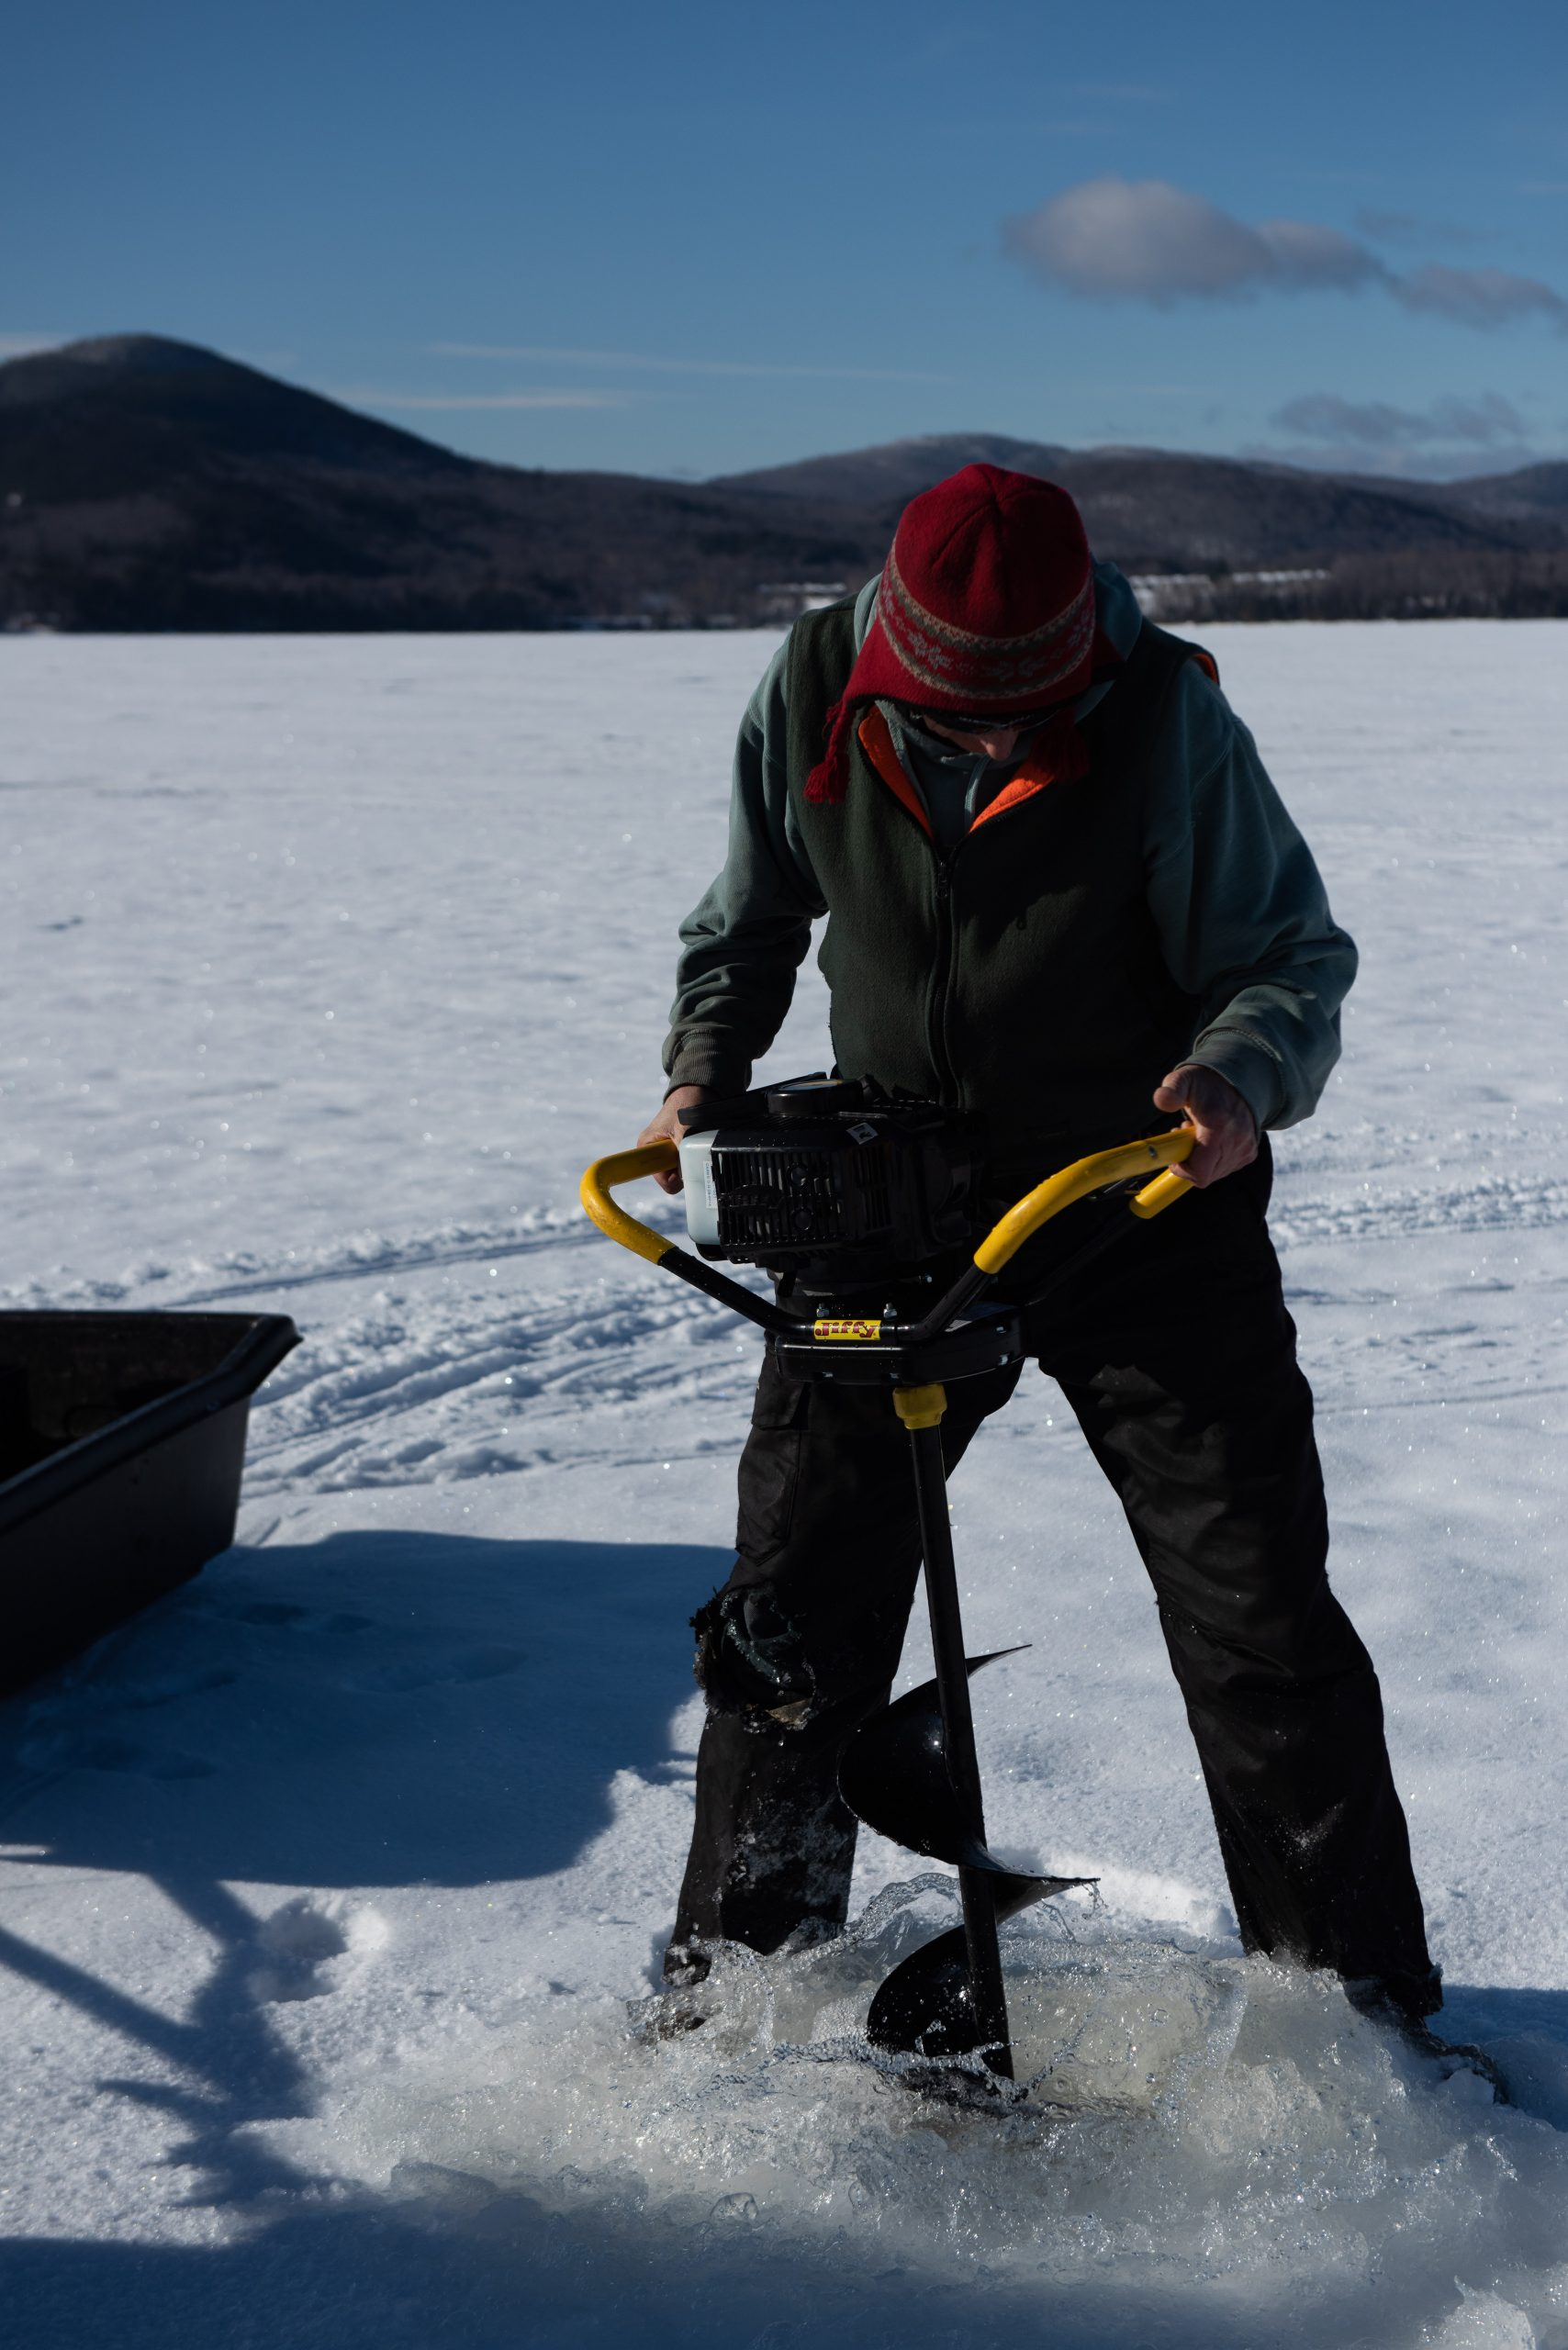 Ice Fishing on Moosehead Lake in Maine